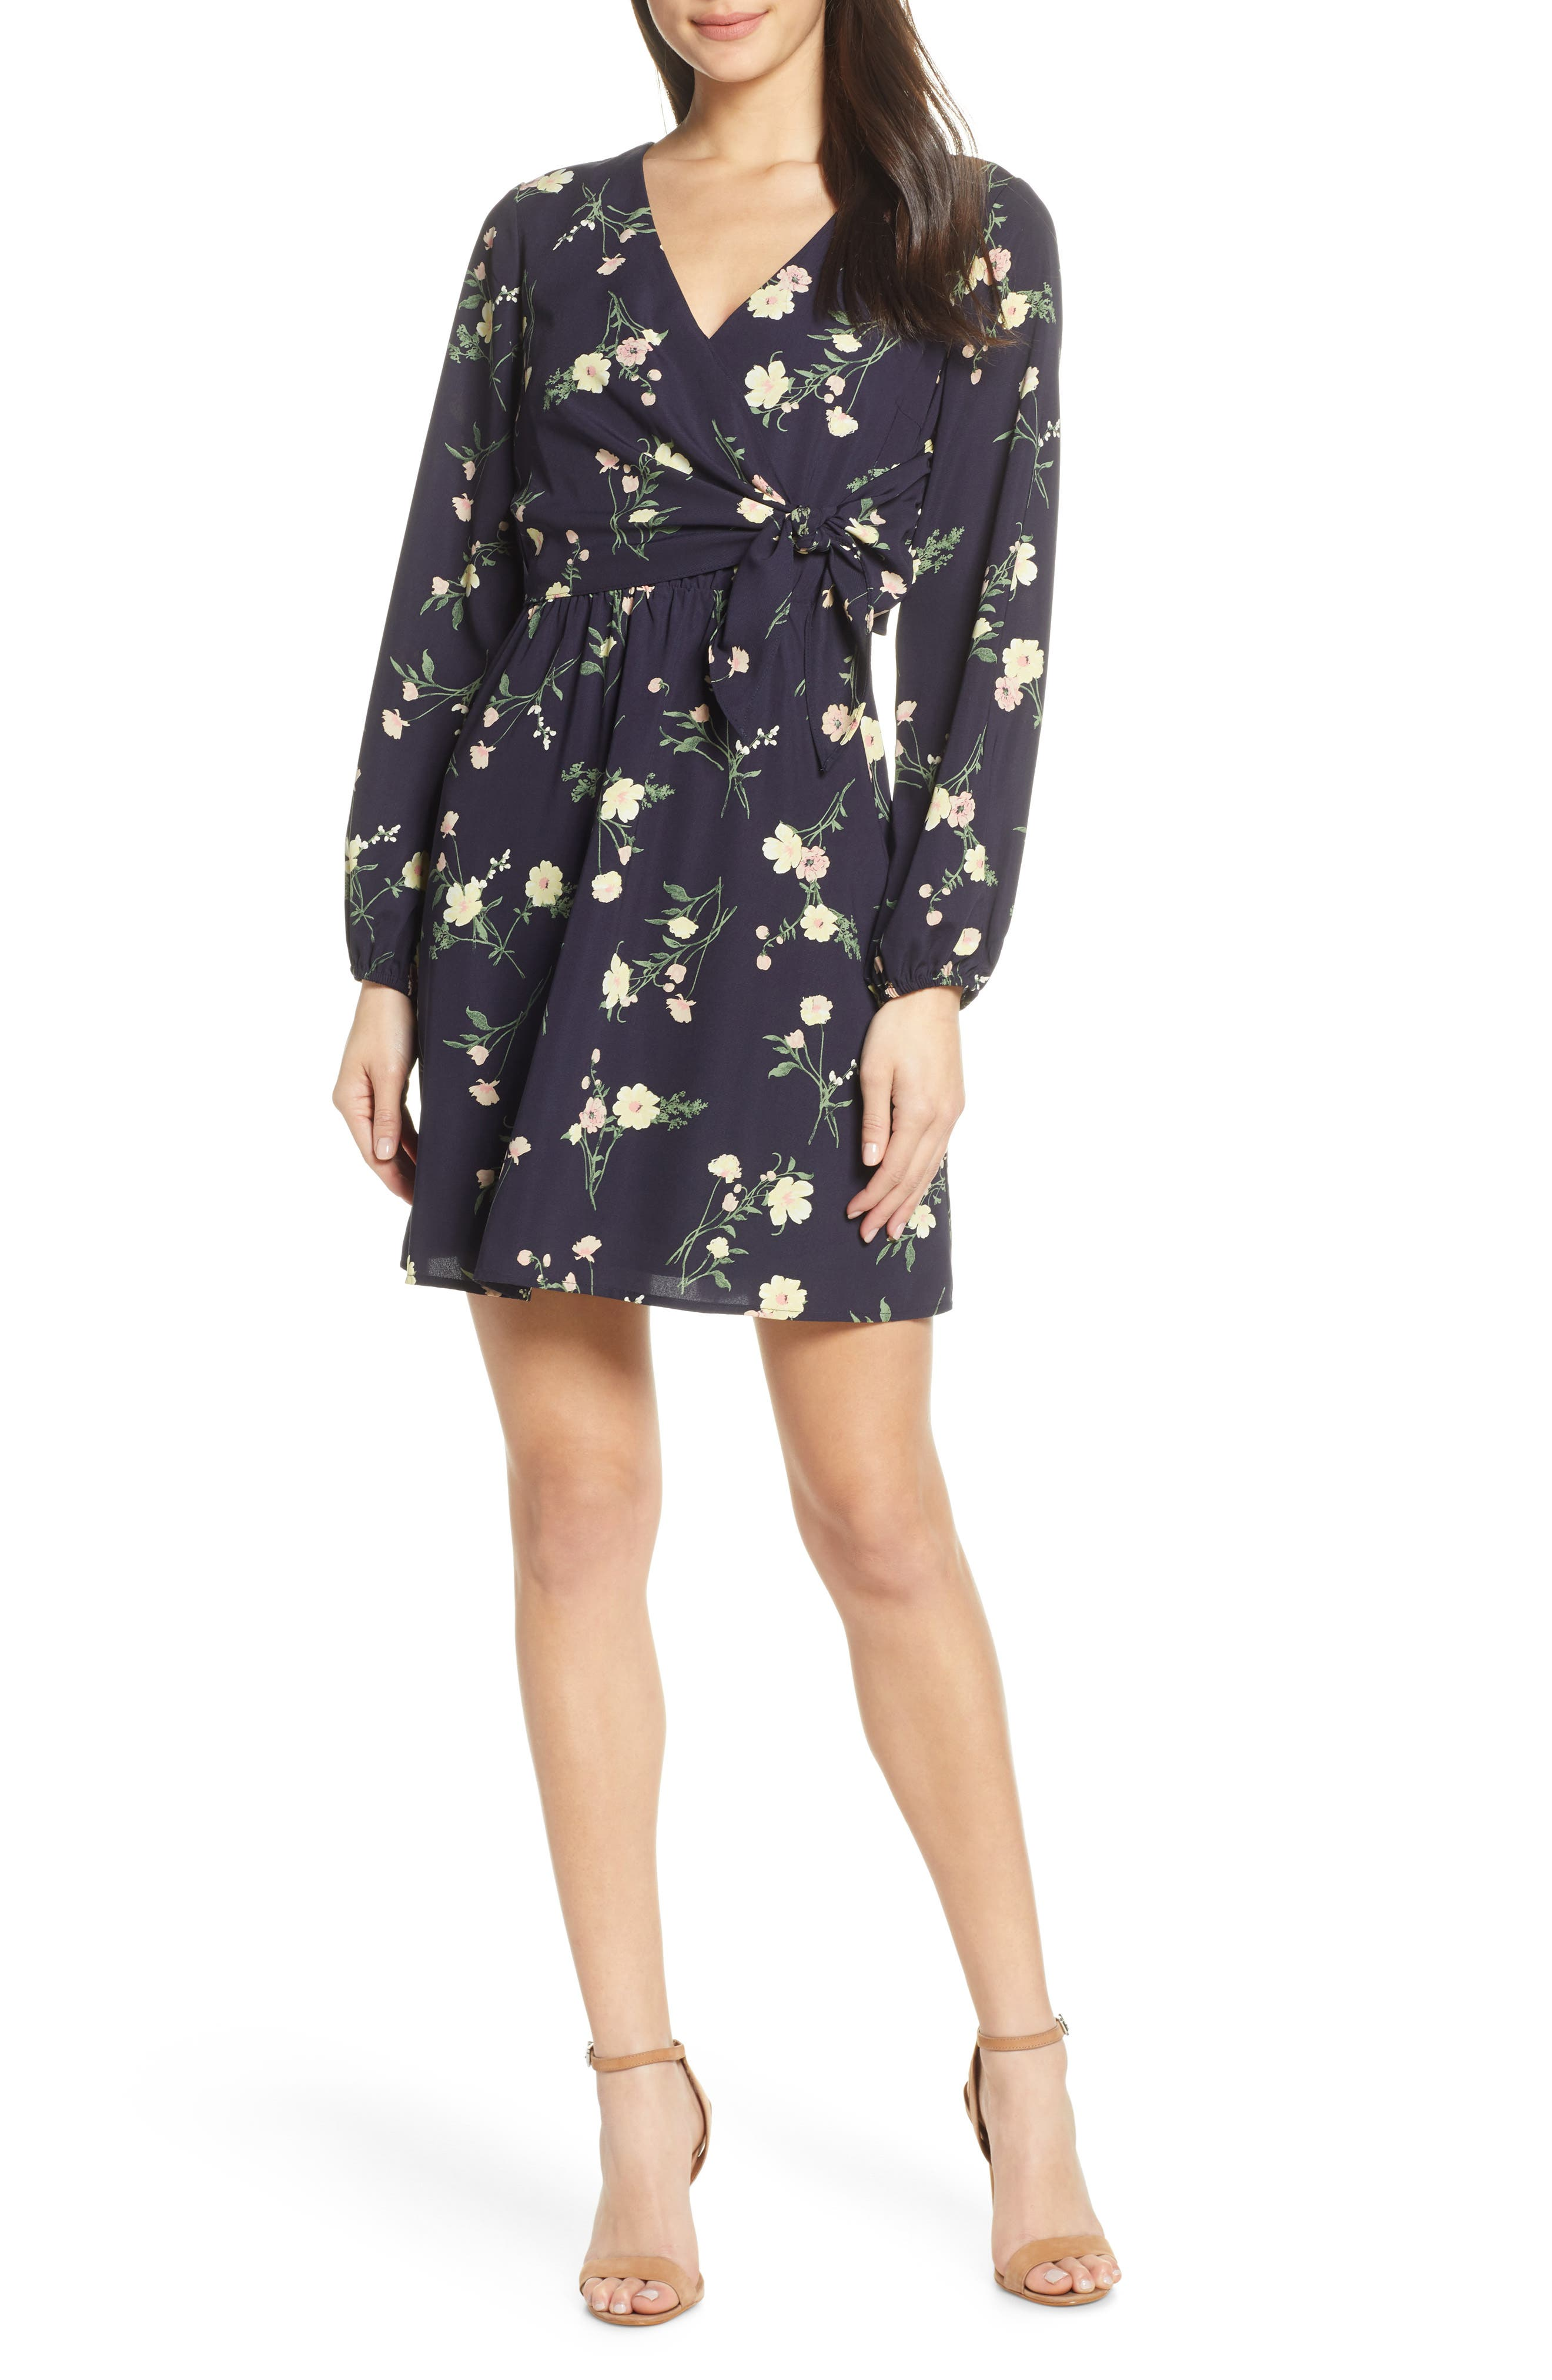 19 COOPER Long Sleeve Floral Dress, Main, color, NAVY FLORAL